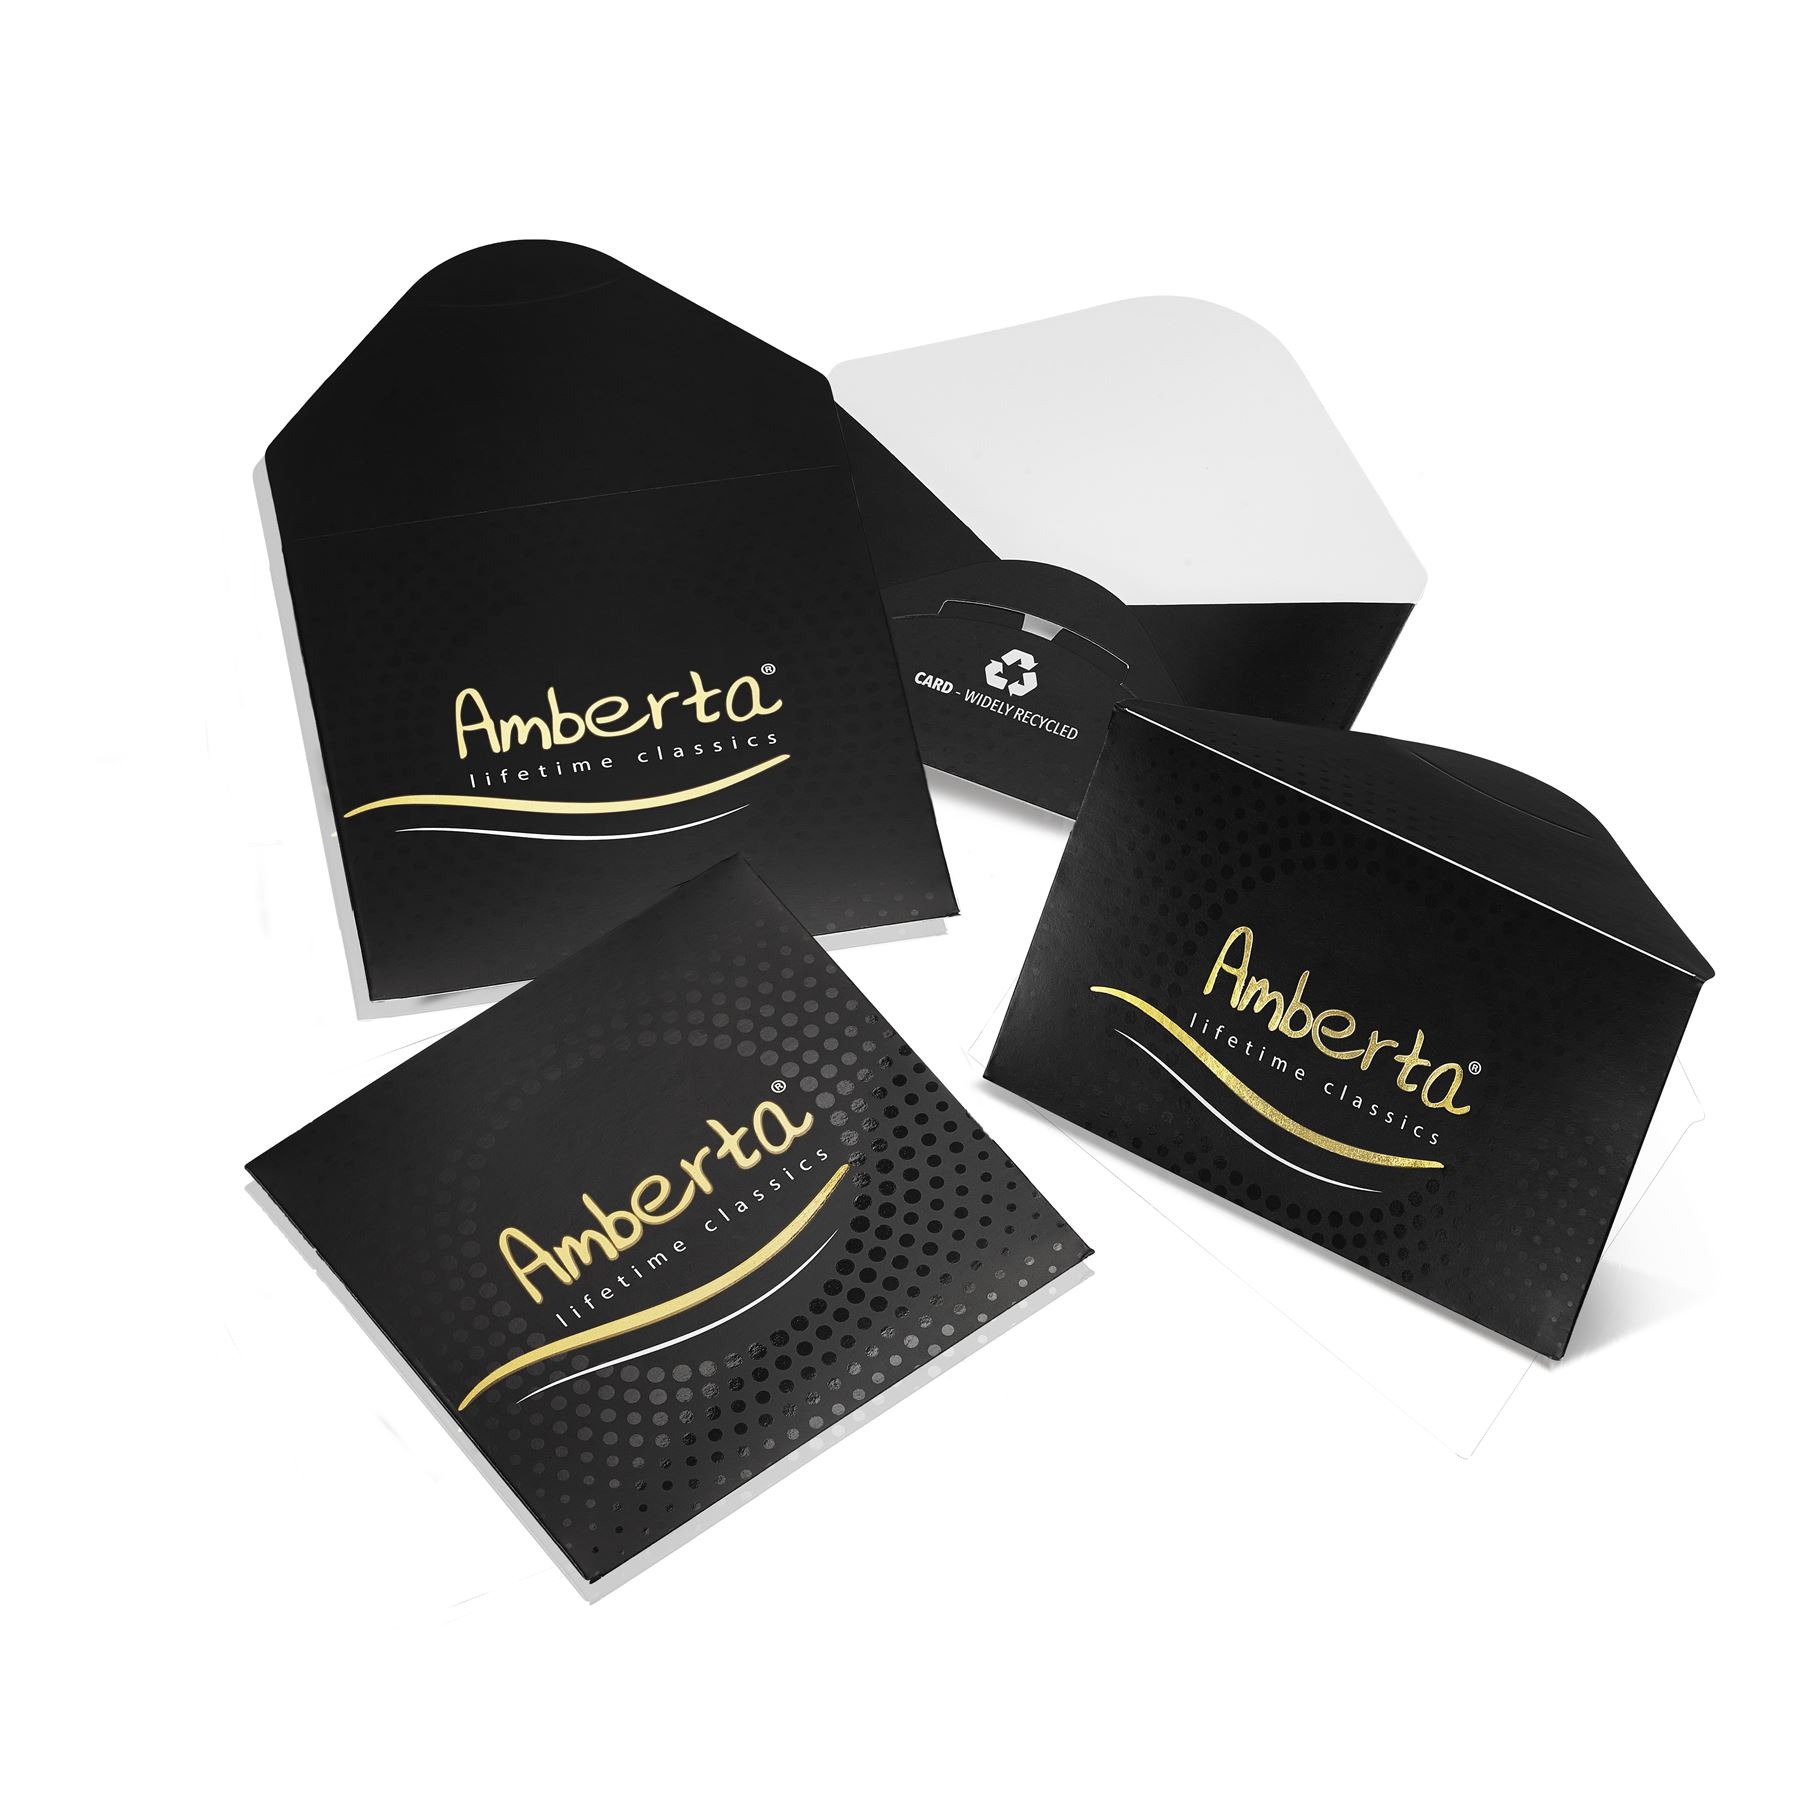 Amberta-925-Sterling-Silver-Celtic-Knot-Earrings-for-Women-Irish-Design miniature 31